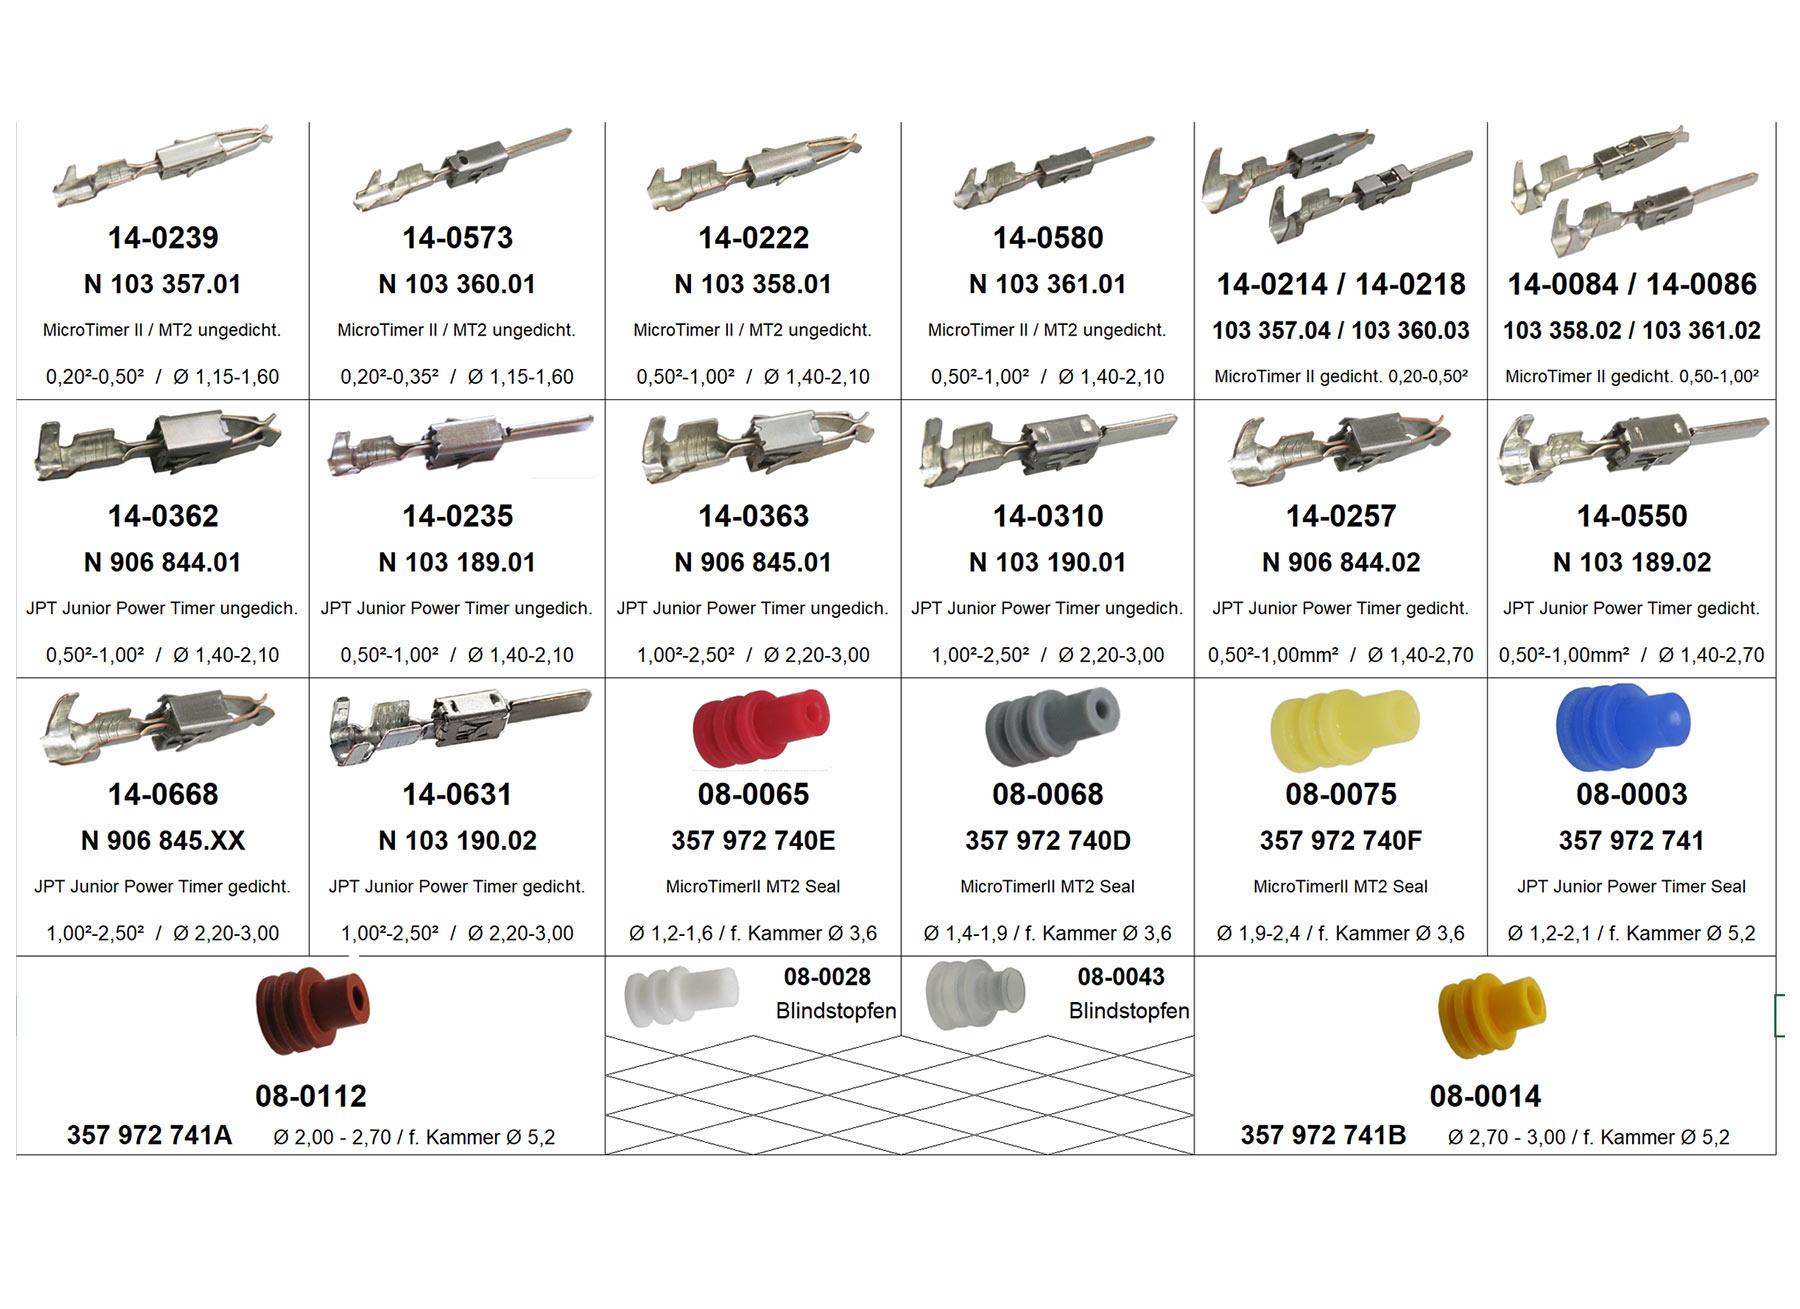 10x JPT Junior Power Timer Buchse Kontakt 1,50²-2,50² VW N 906 845.01 906845.01